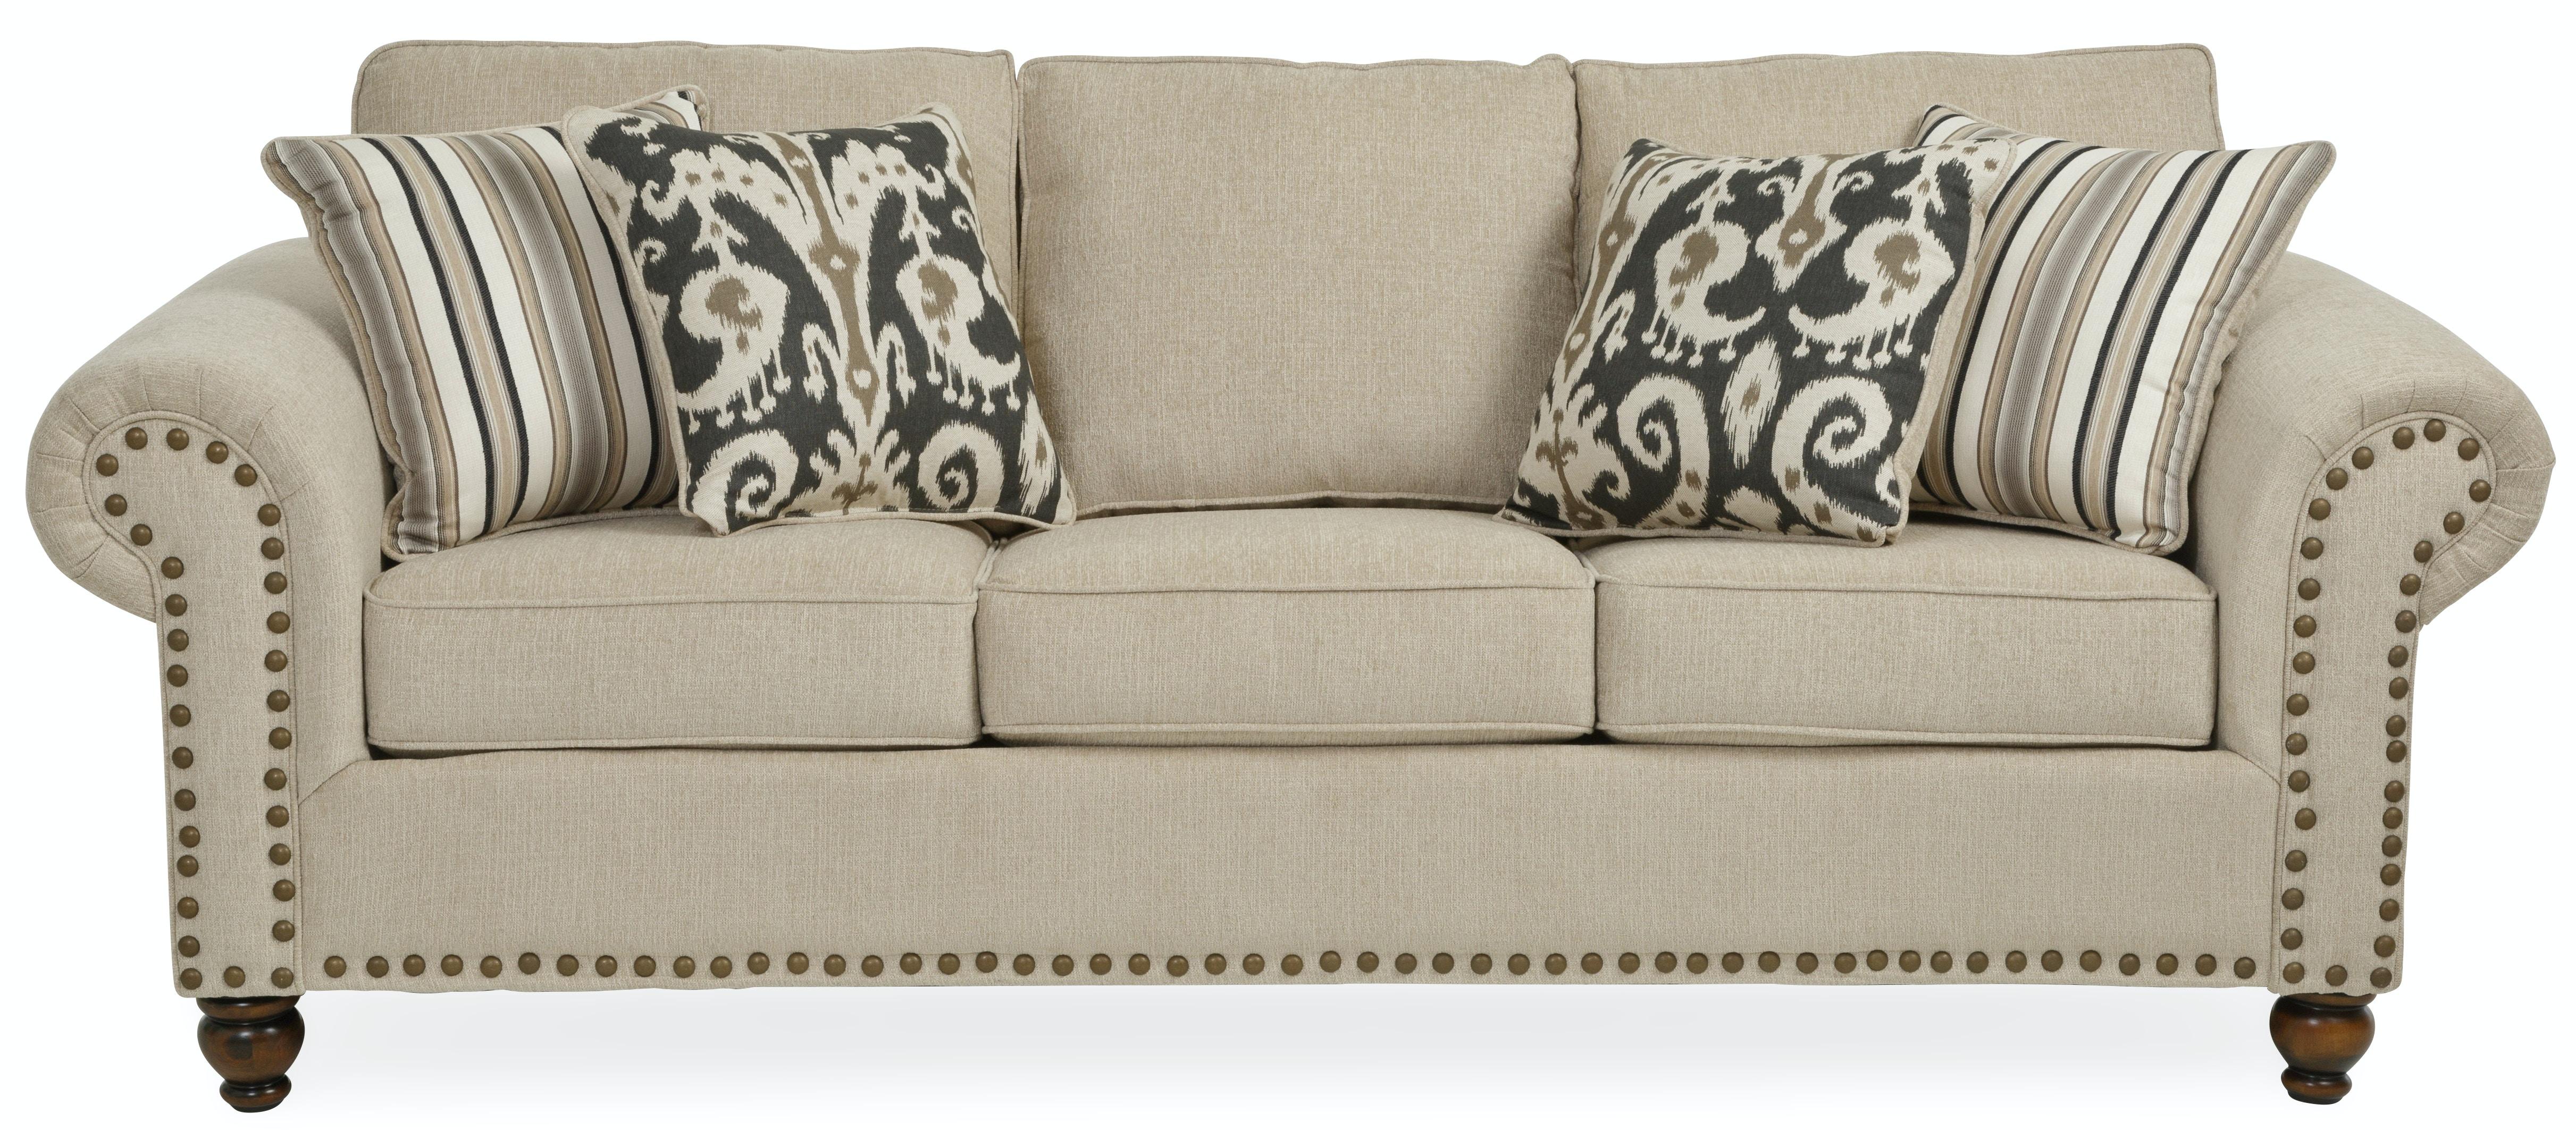 Fairly Sofa ST:424451